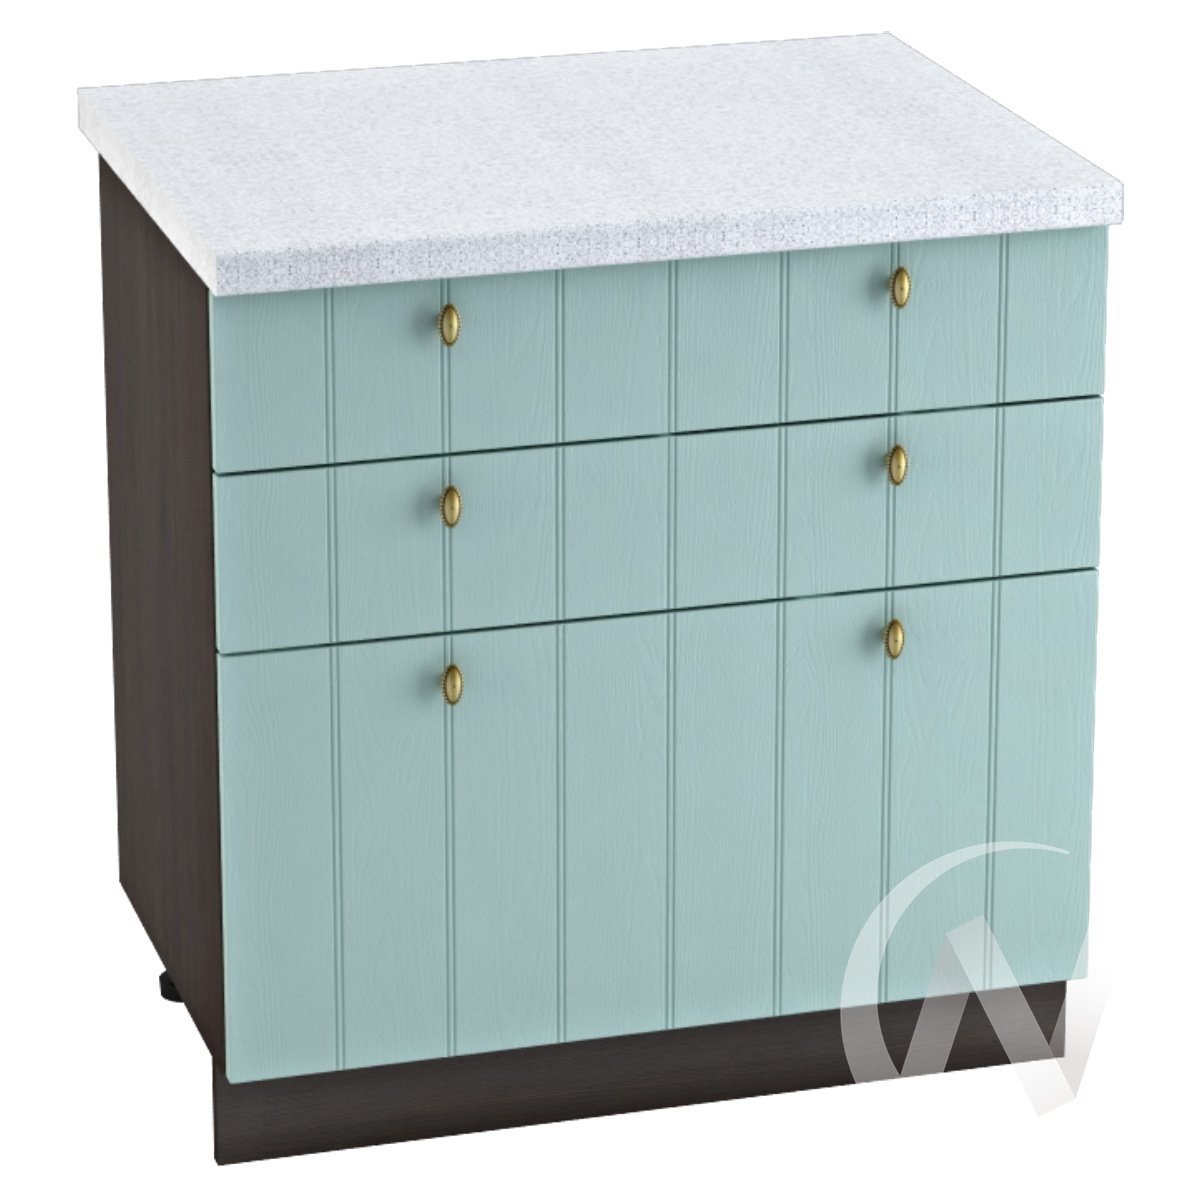 "Кухня ""Прованс"": Шкаф нижний с 3-мя ящиками 800, ШН3Я 800 (голубой/корпус венге)"